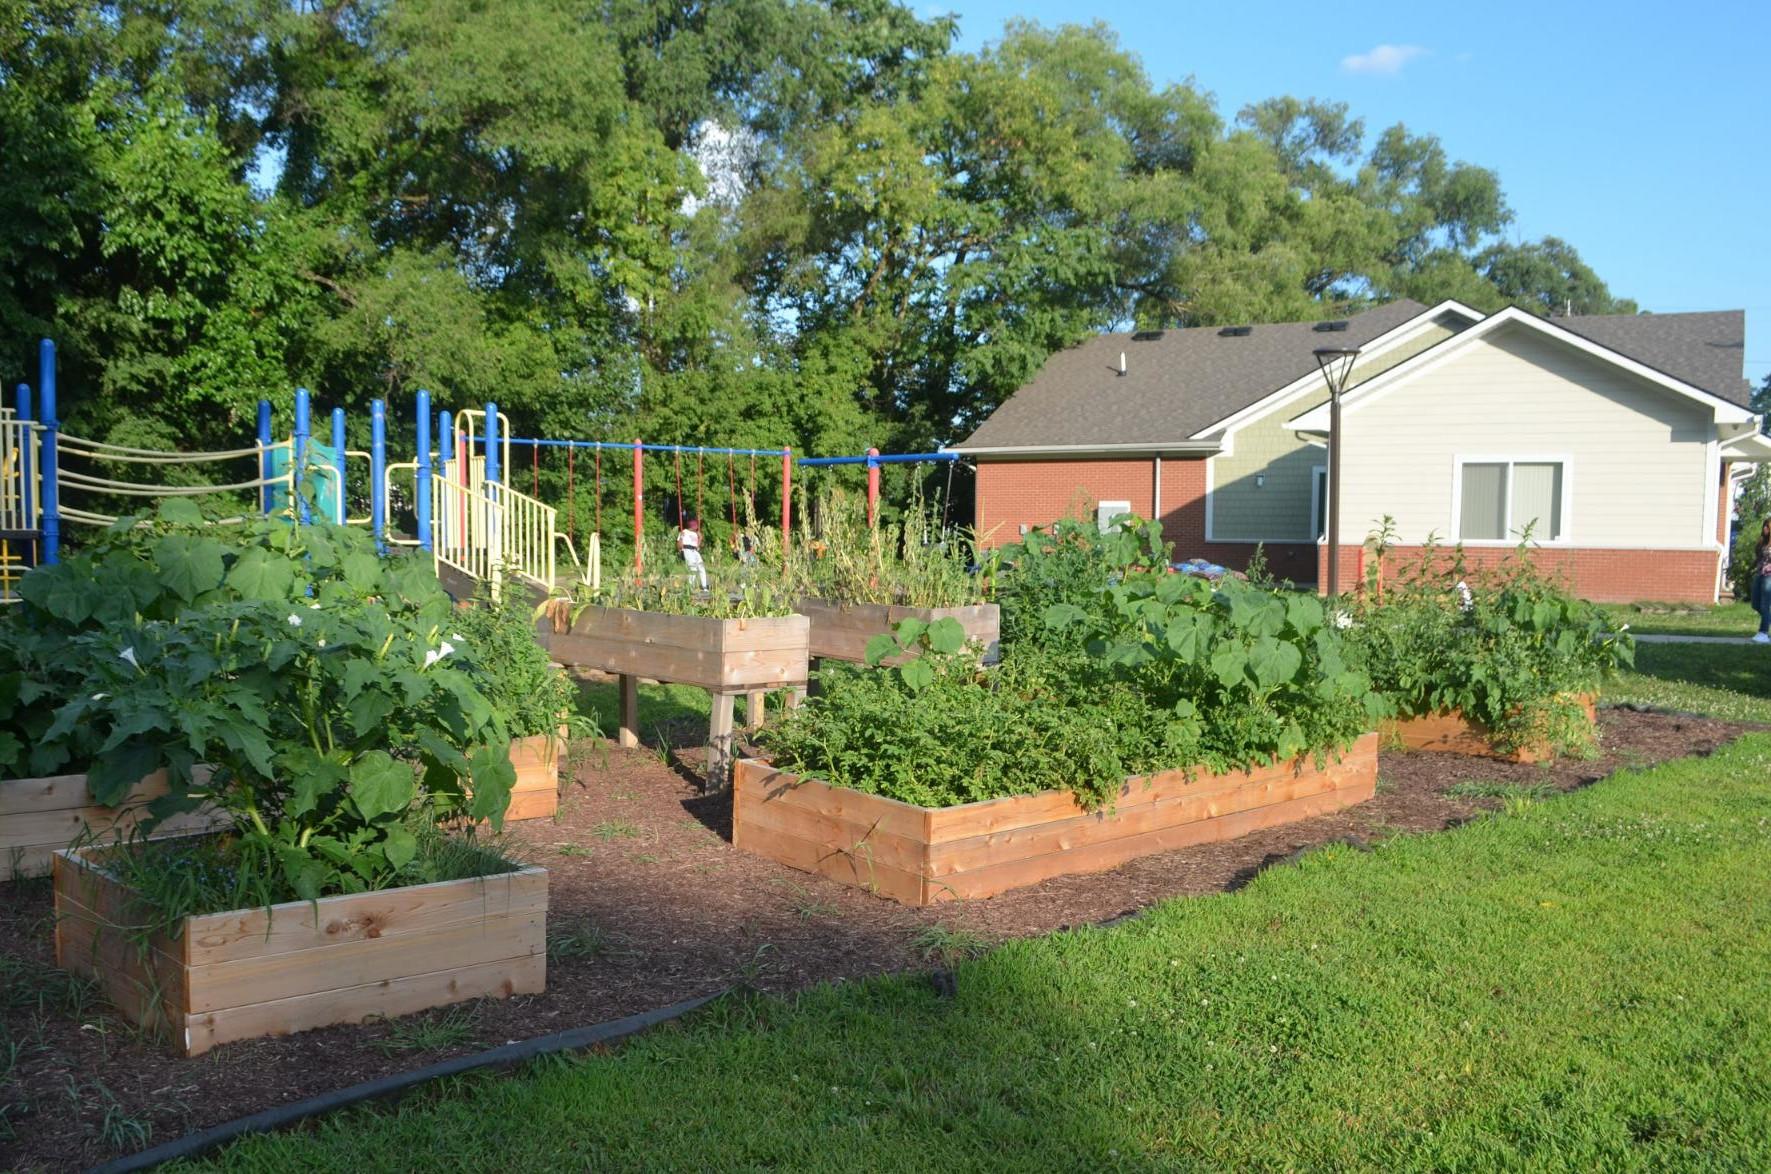 New Community Garden at Sauk Trail Pointe